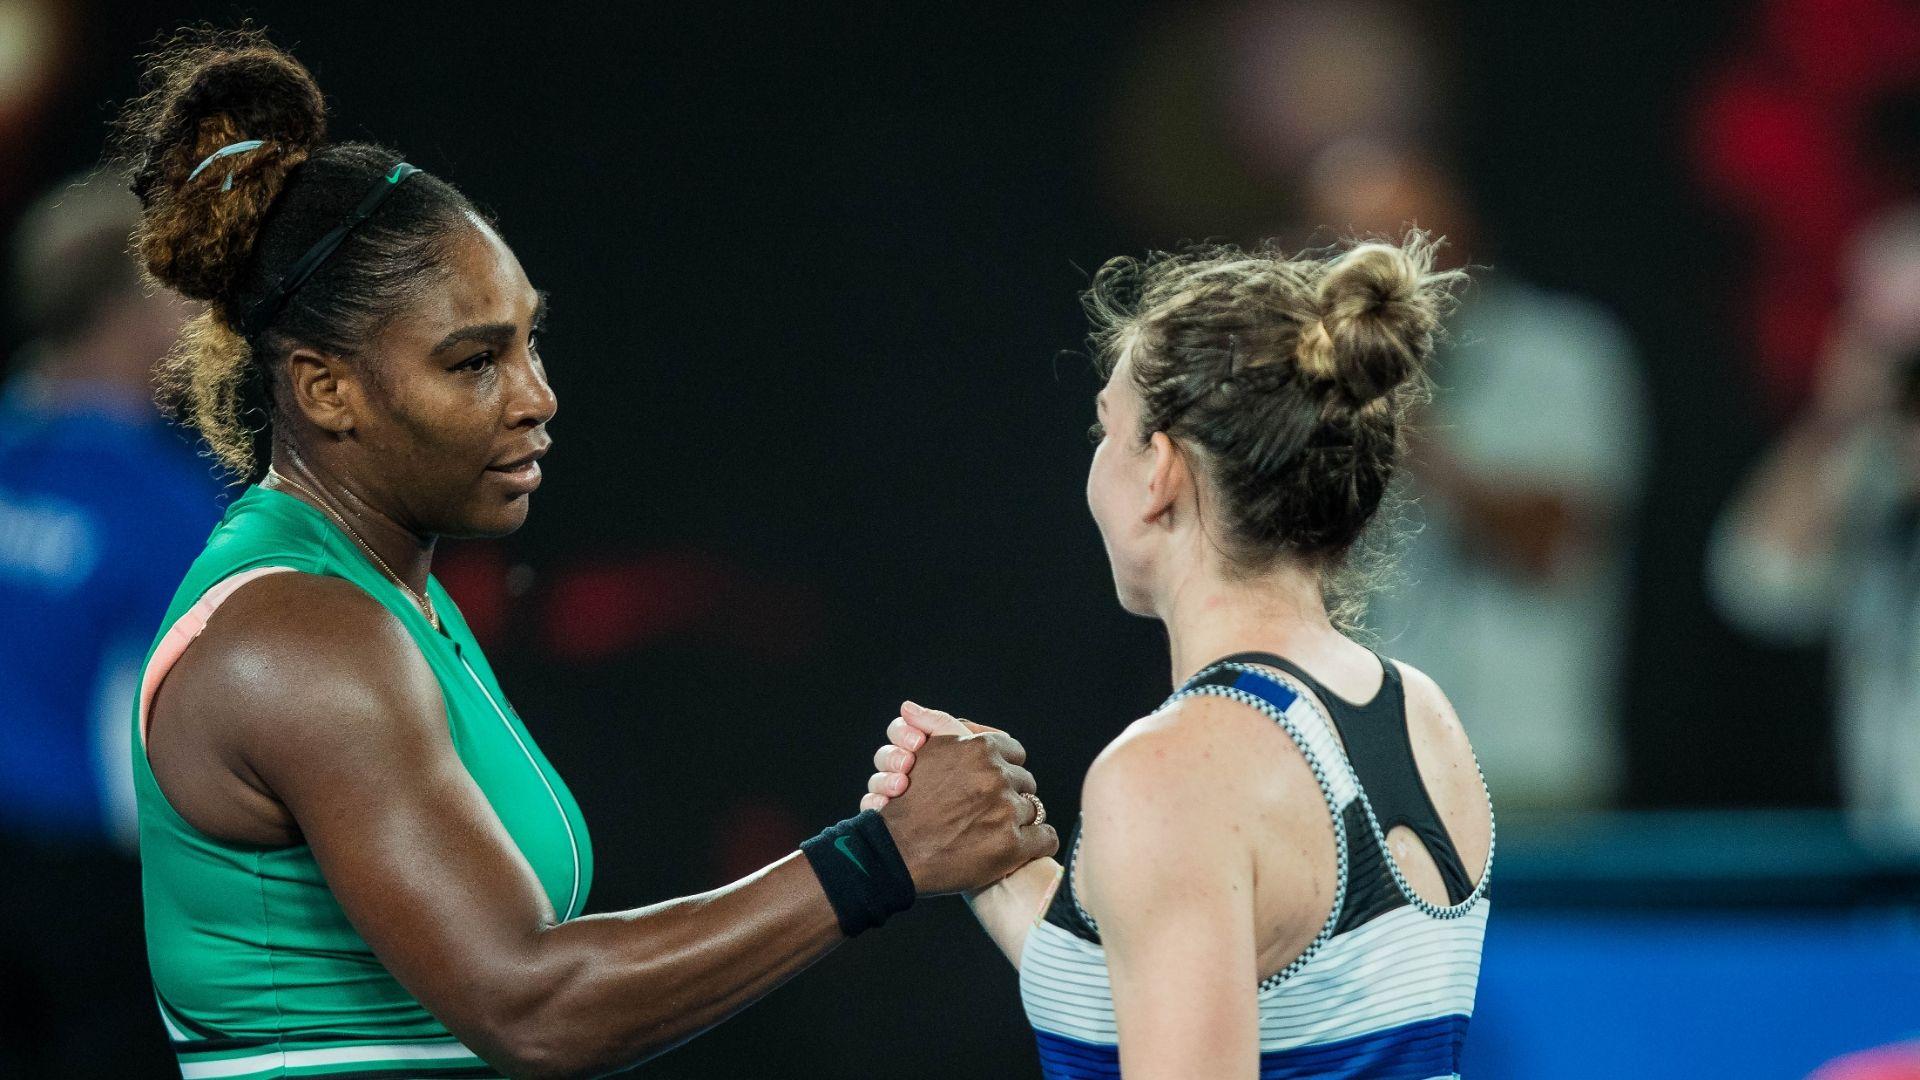 Serena Williams outlasts No. 1 seed Simona Halep to advance